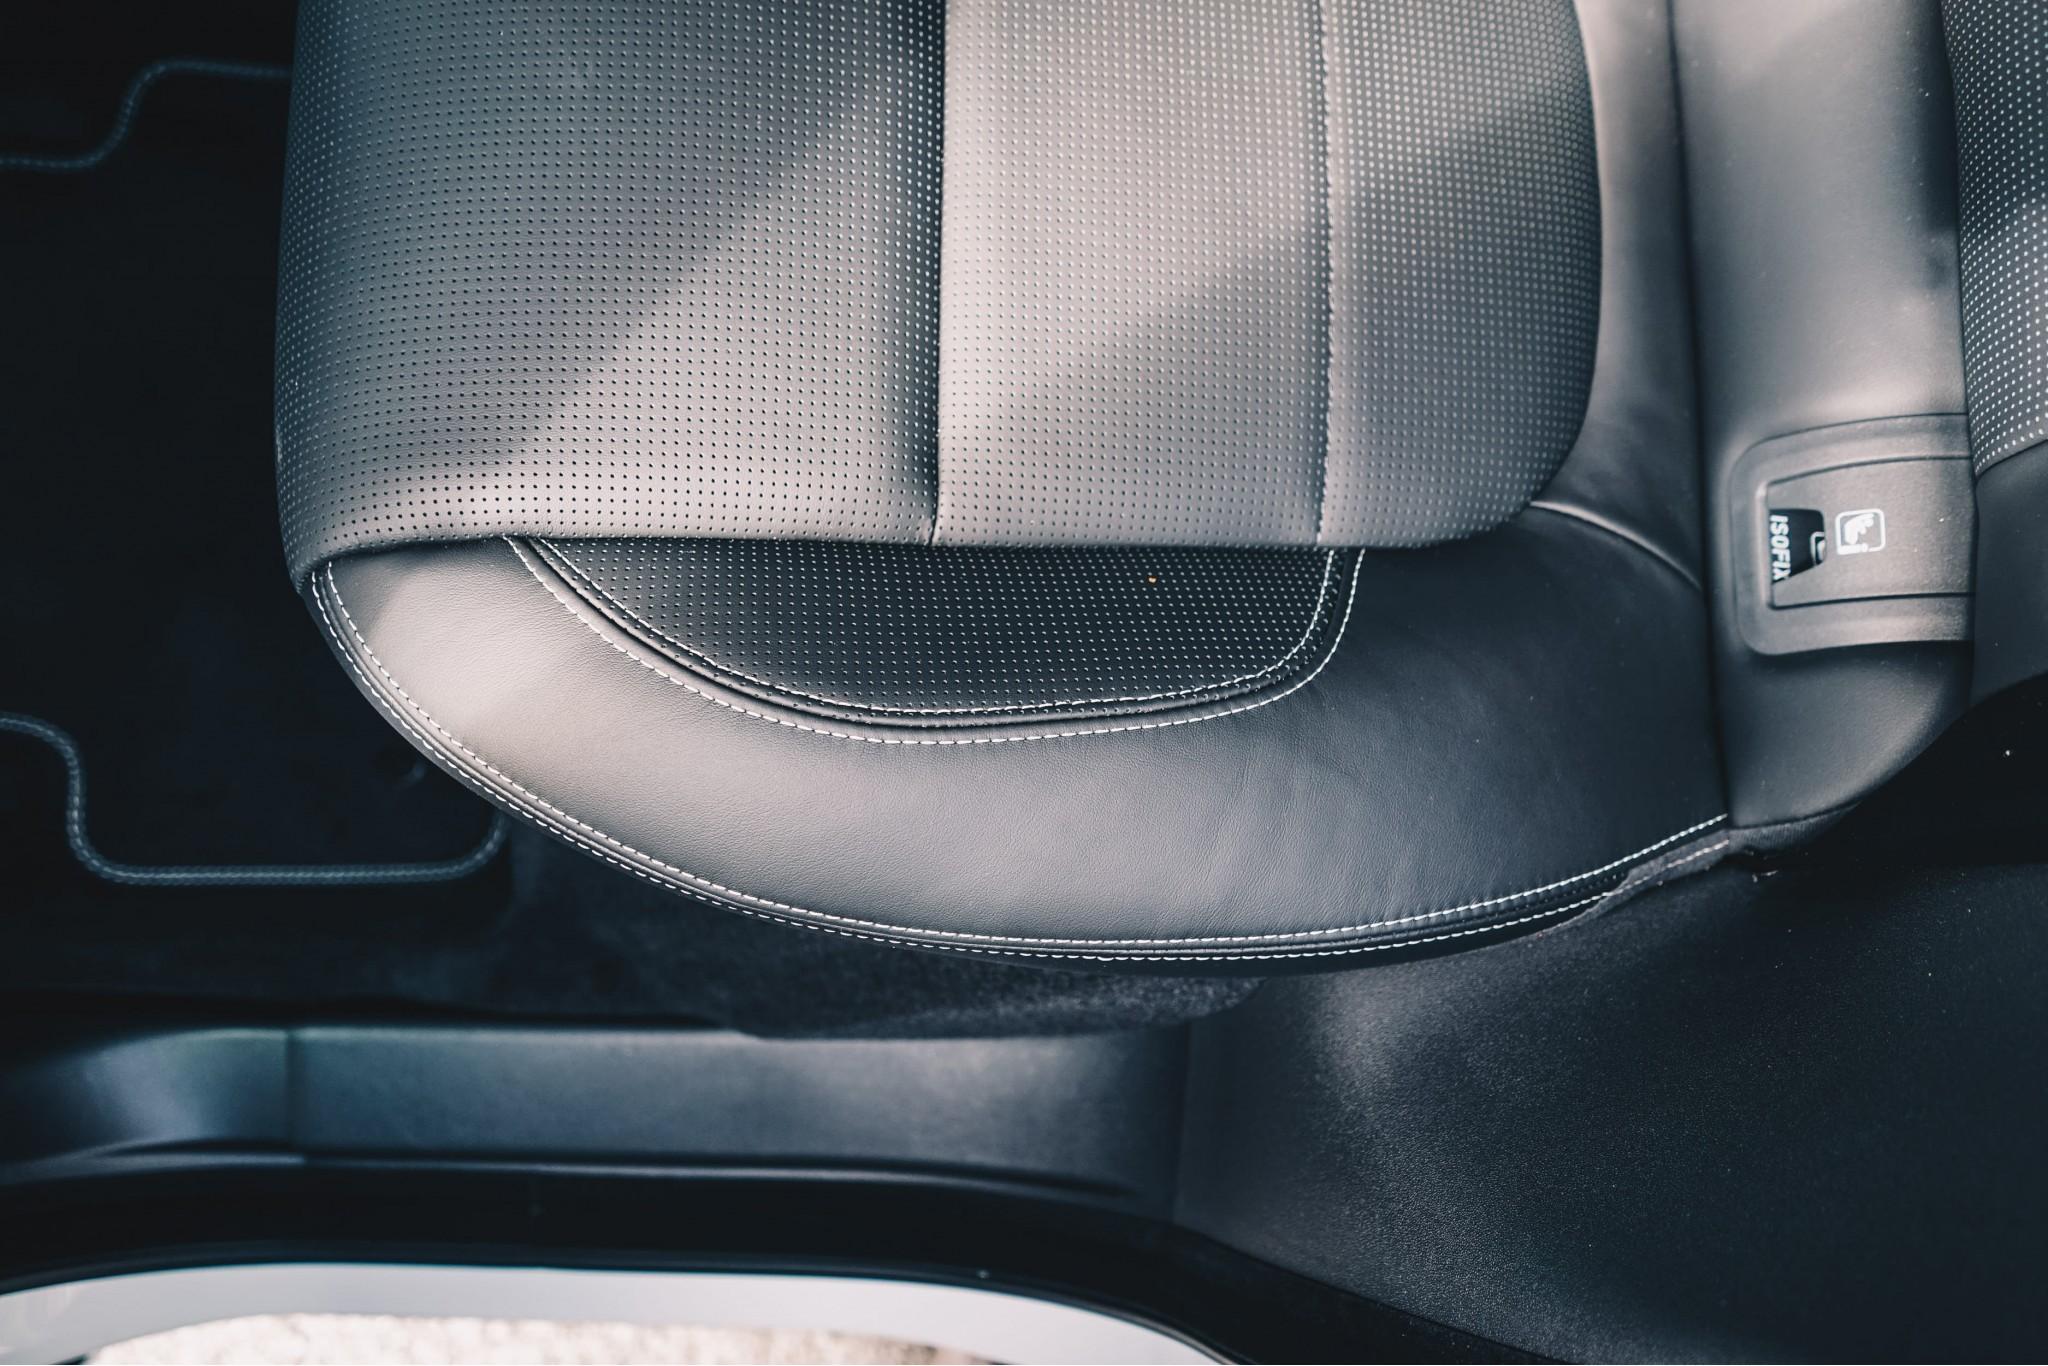 Why the E-PACE is one of the best SUV's in the market